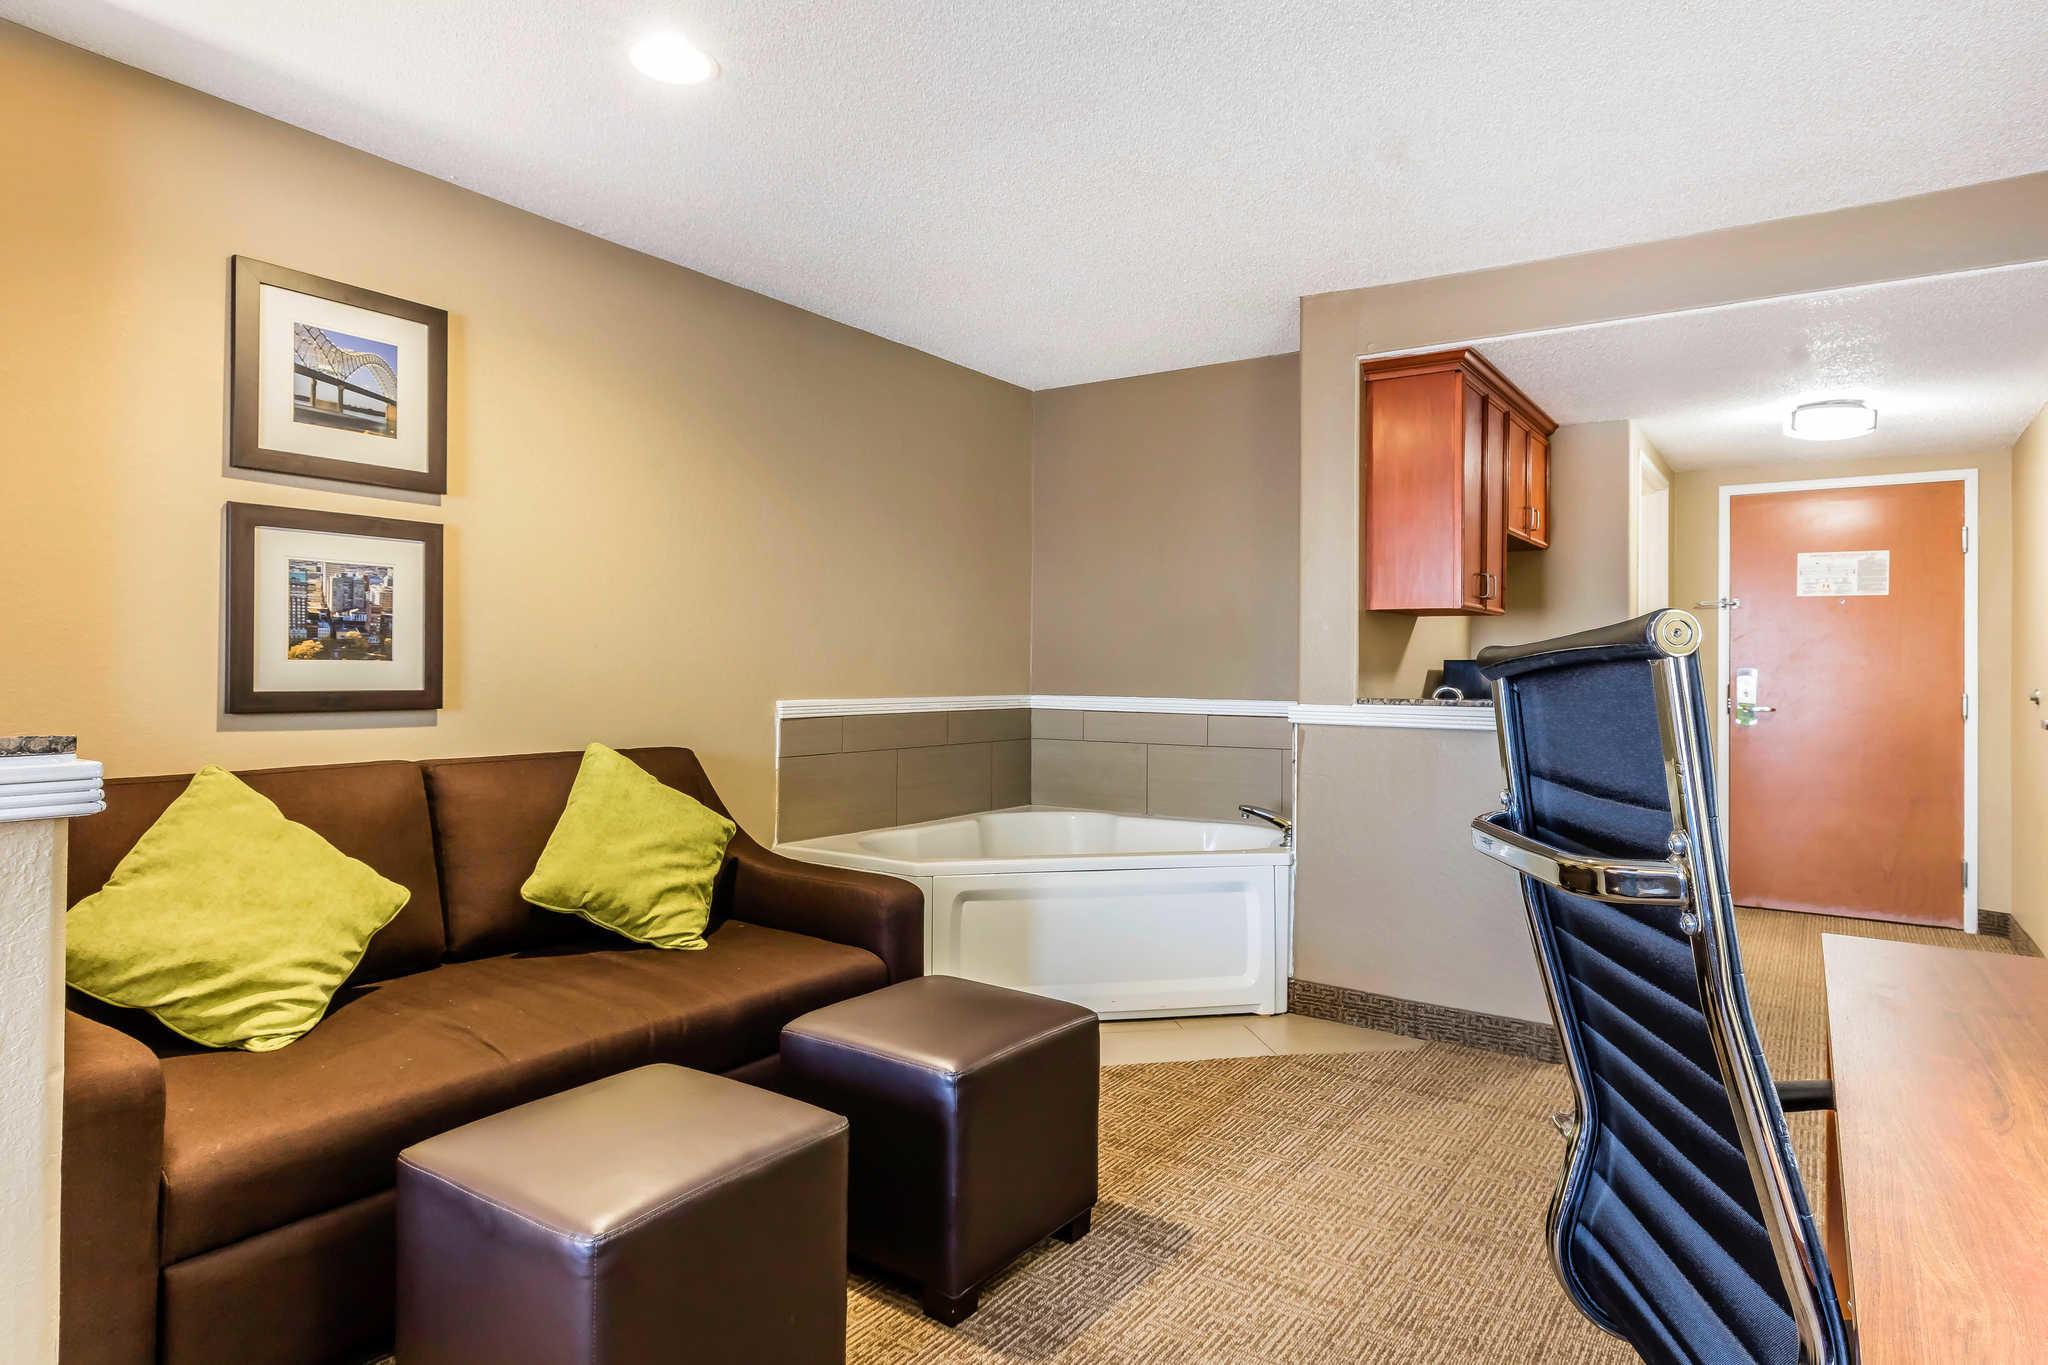 Comfort Inn & Suites Airport-American Way image 16